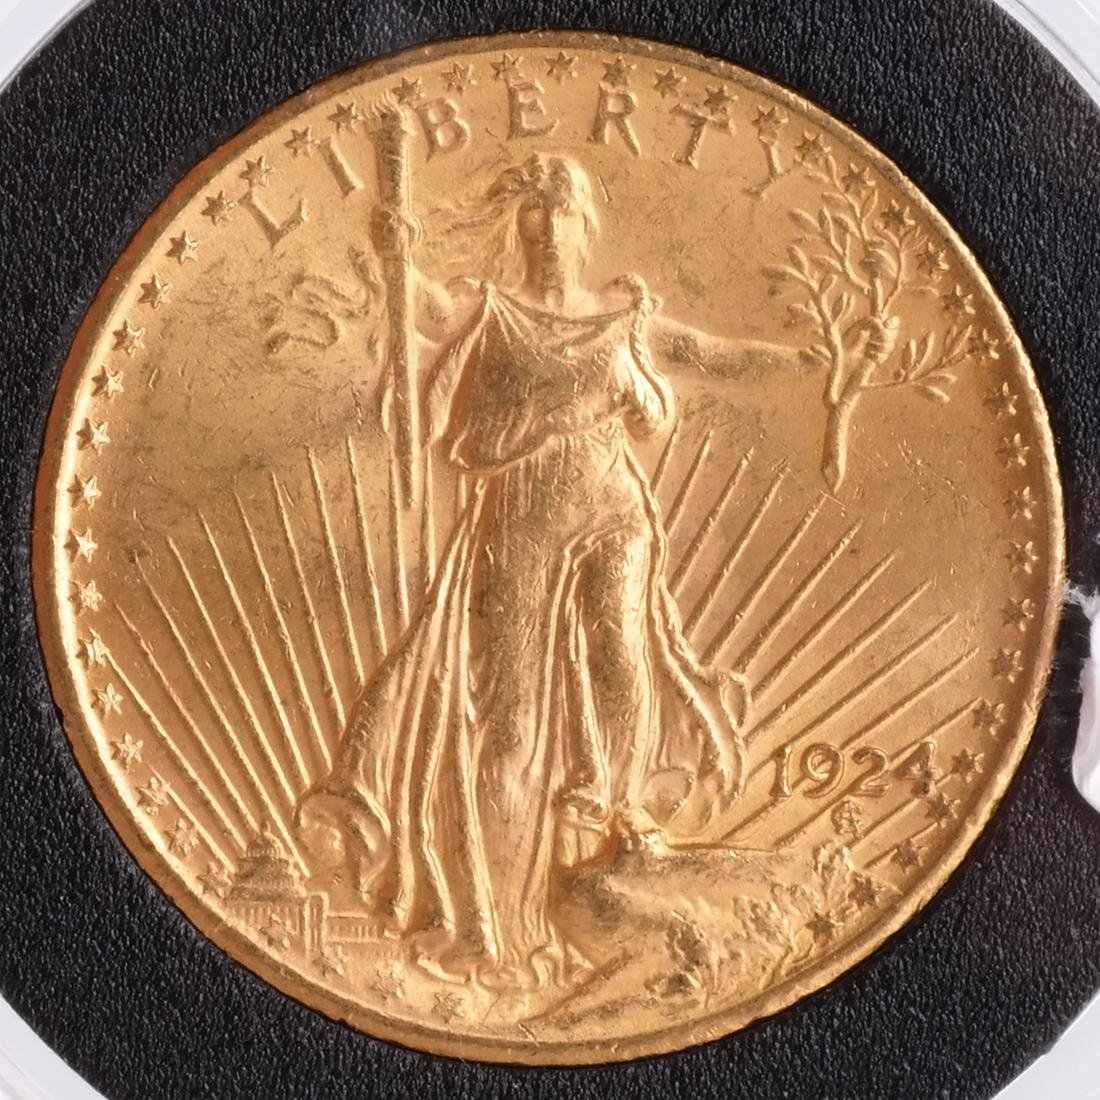 1924 $20 Gold Saint Gaudens, MS 65